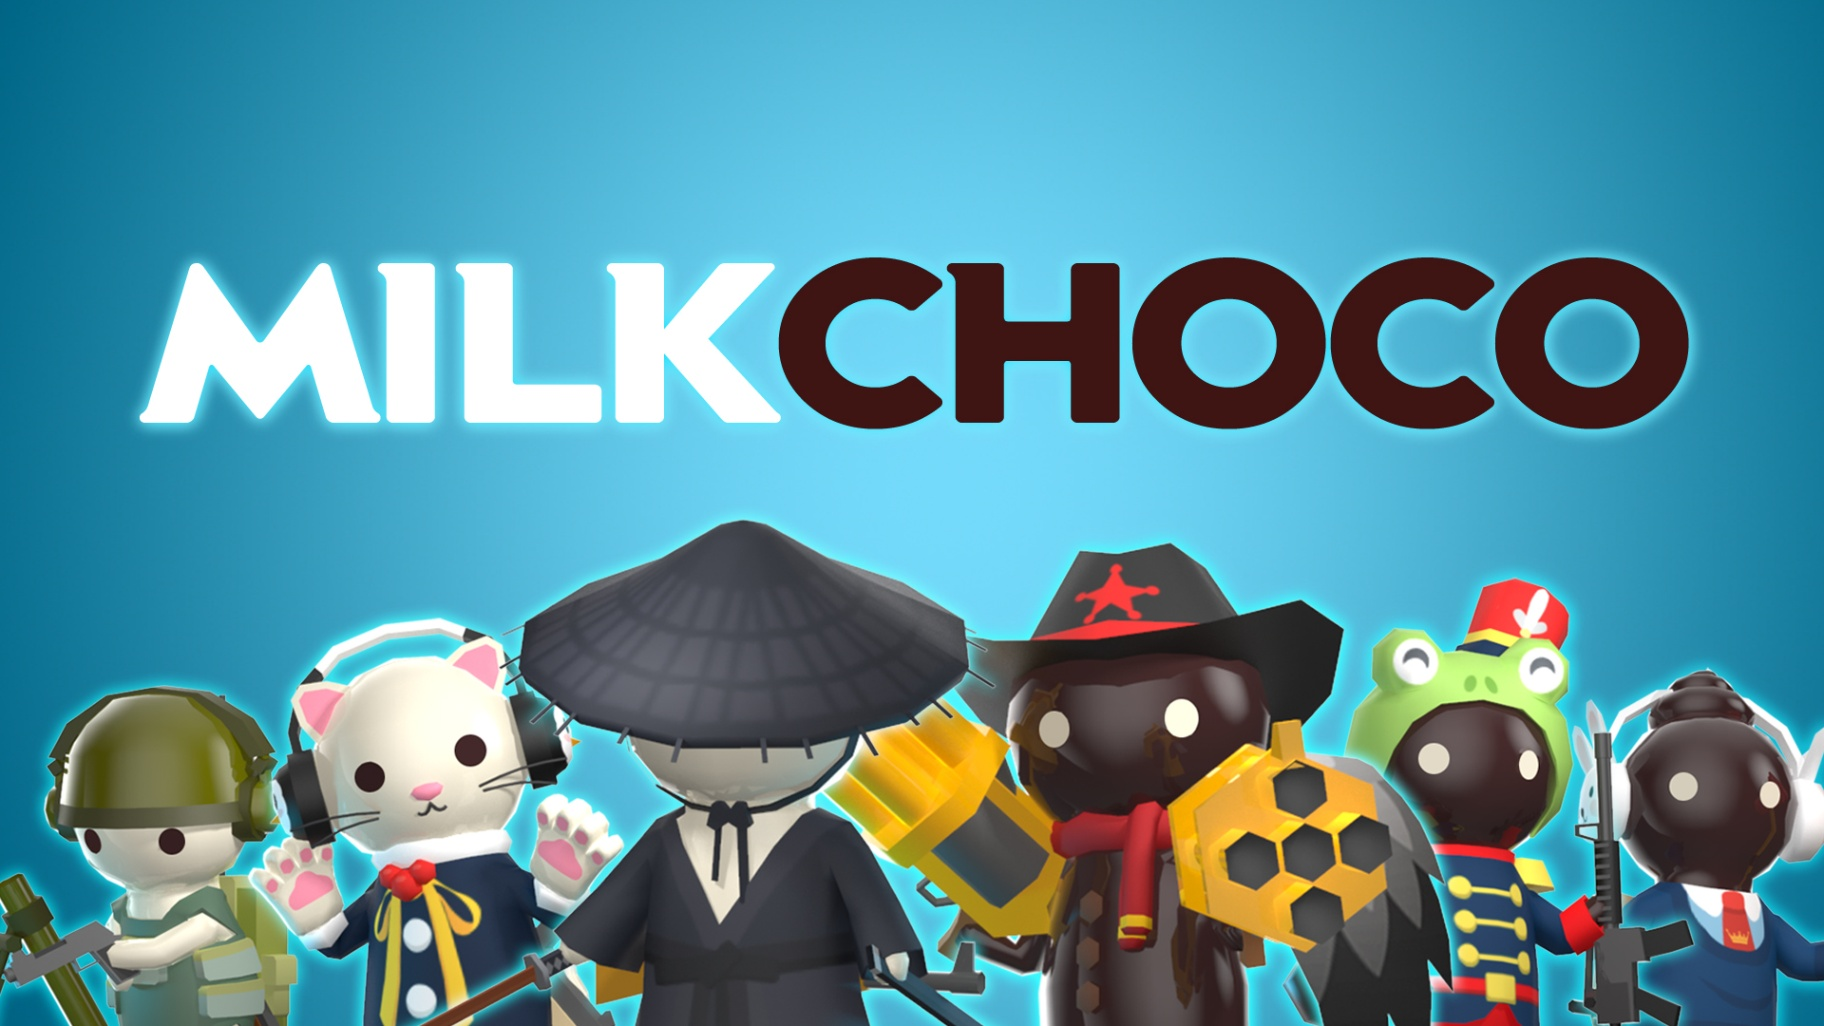 MilkChoco - Discover How to Get Diamonds